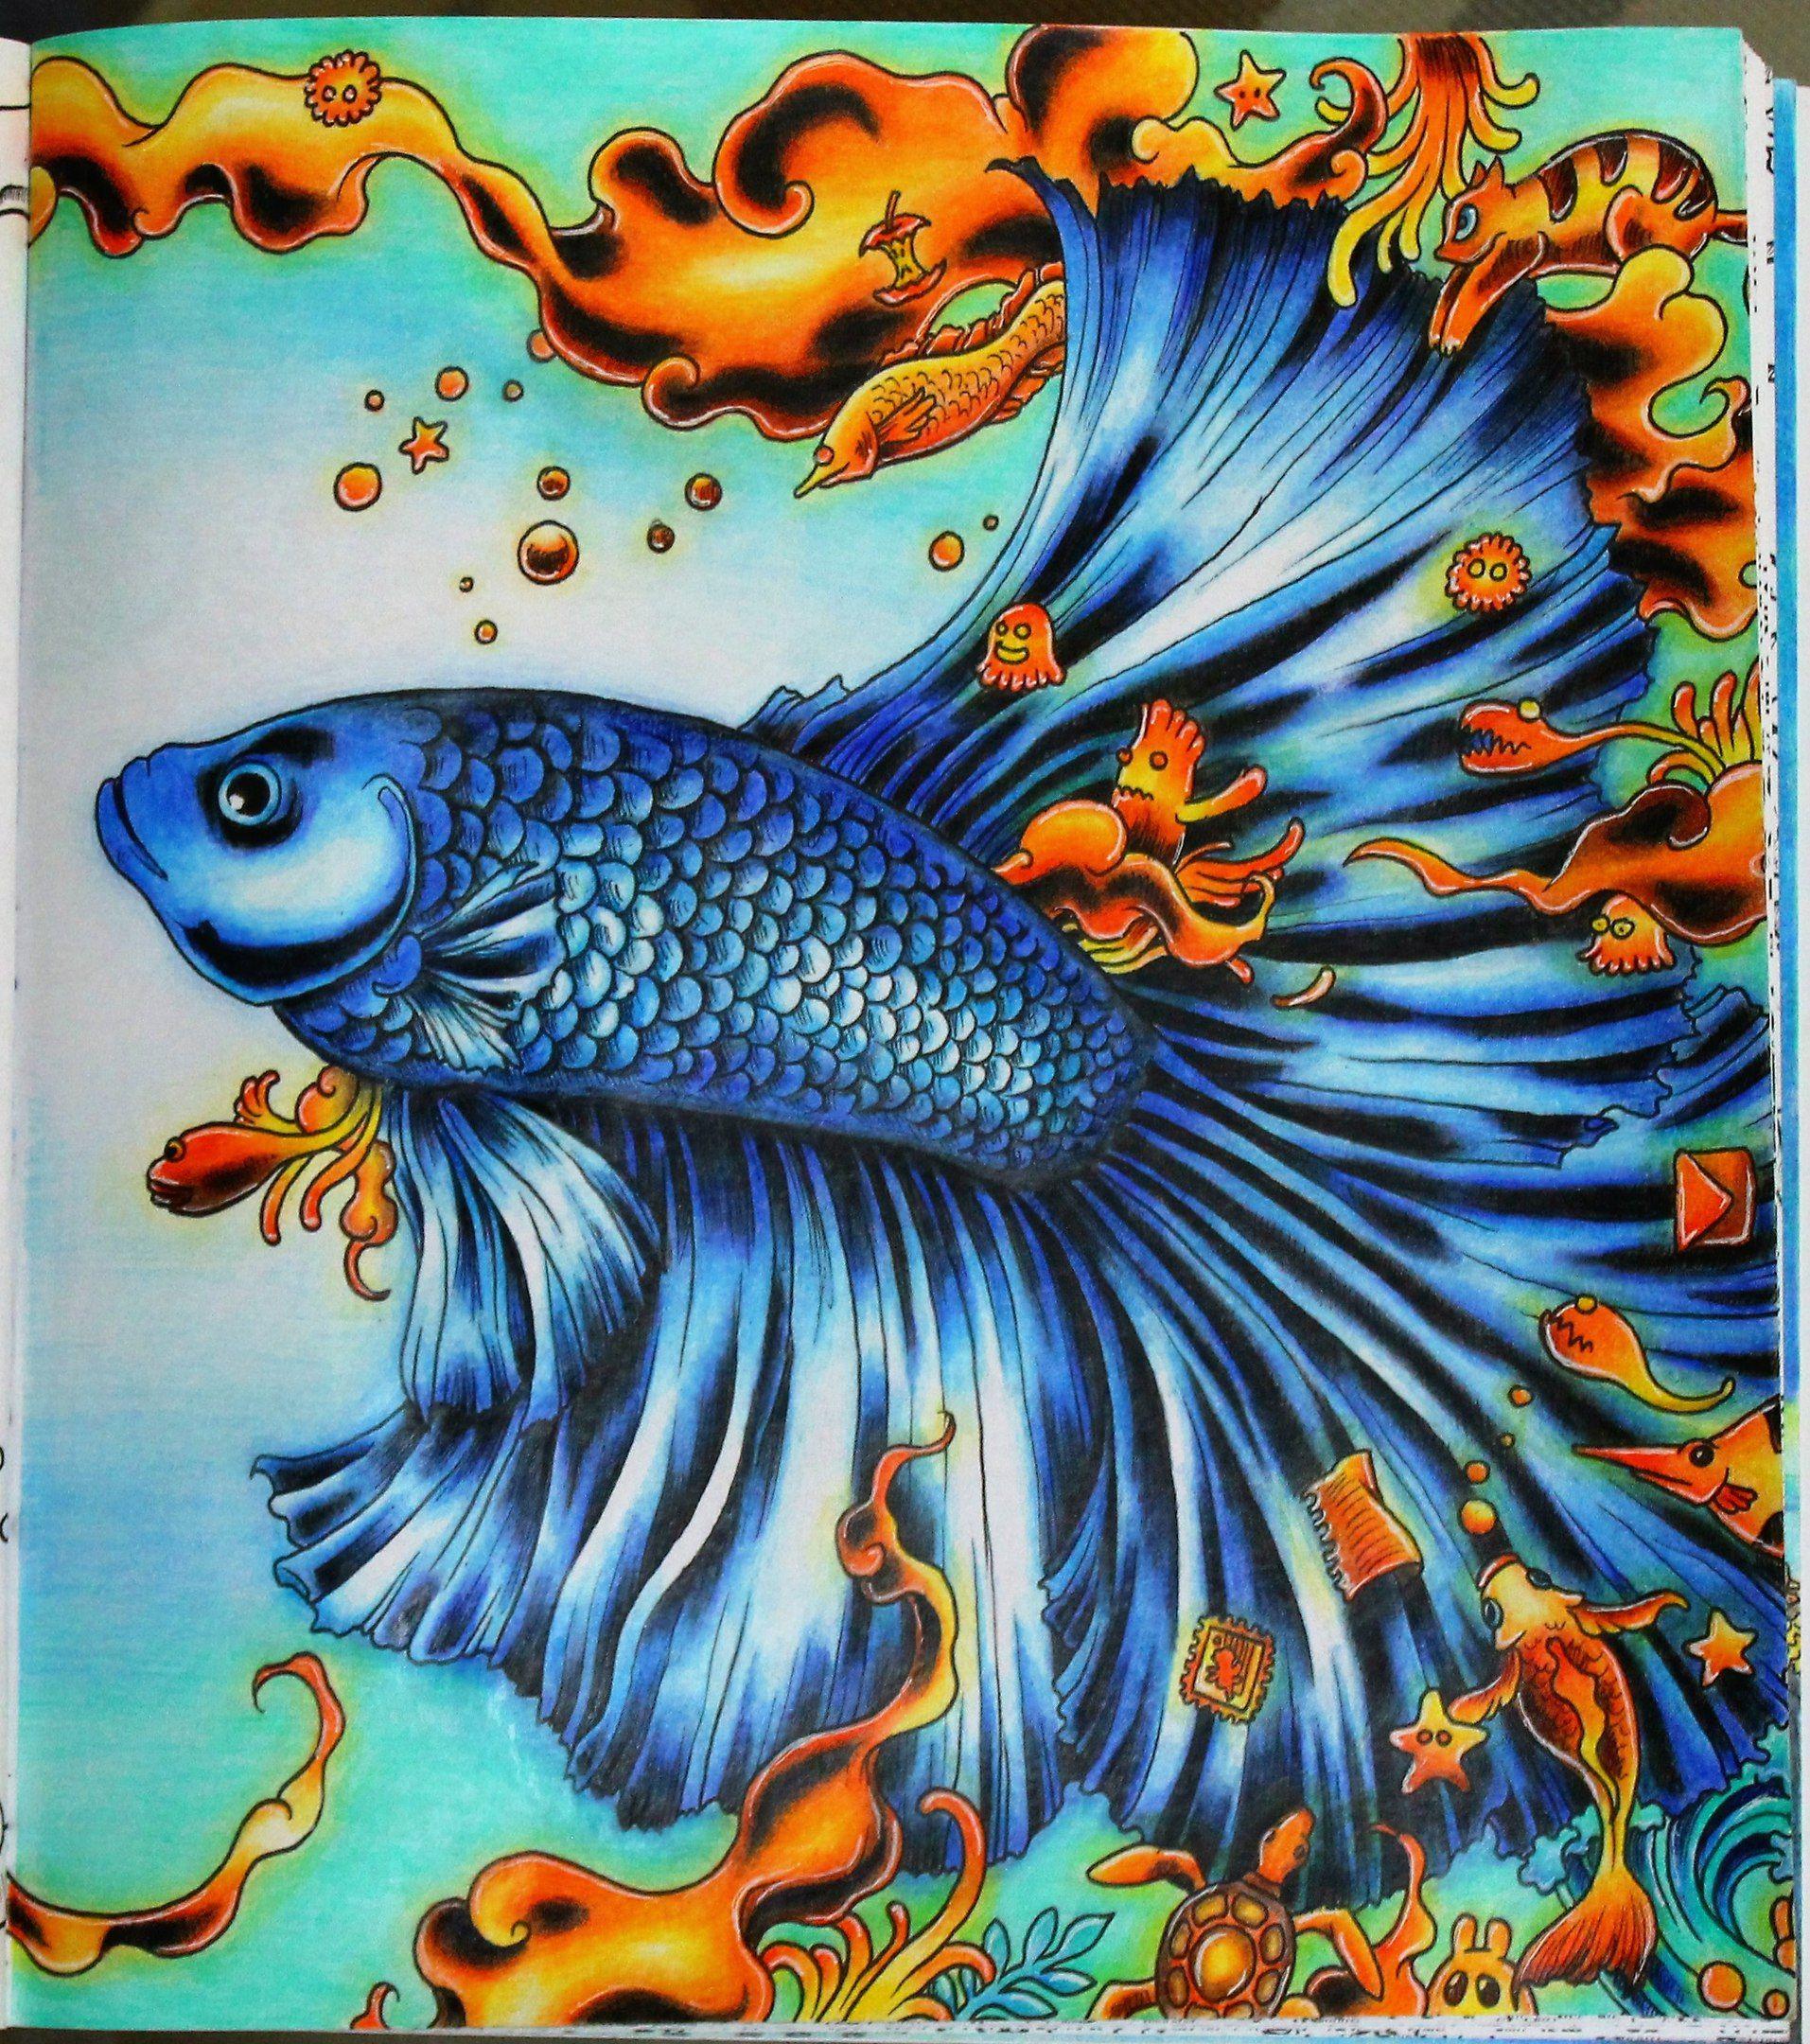 Animorphia Kerbyrosanes Giotto Art Fish Bettasplendens